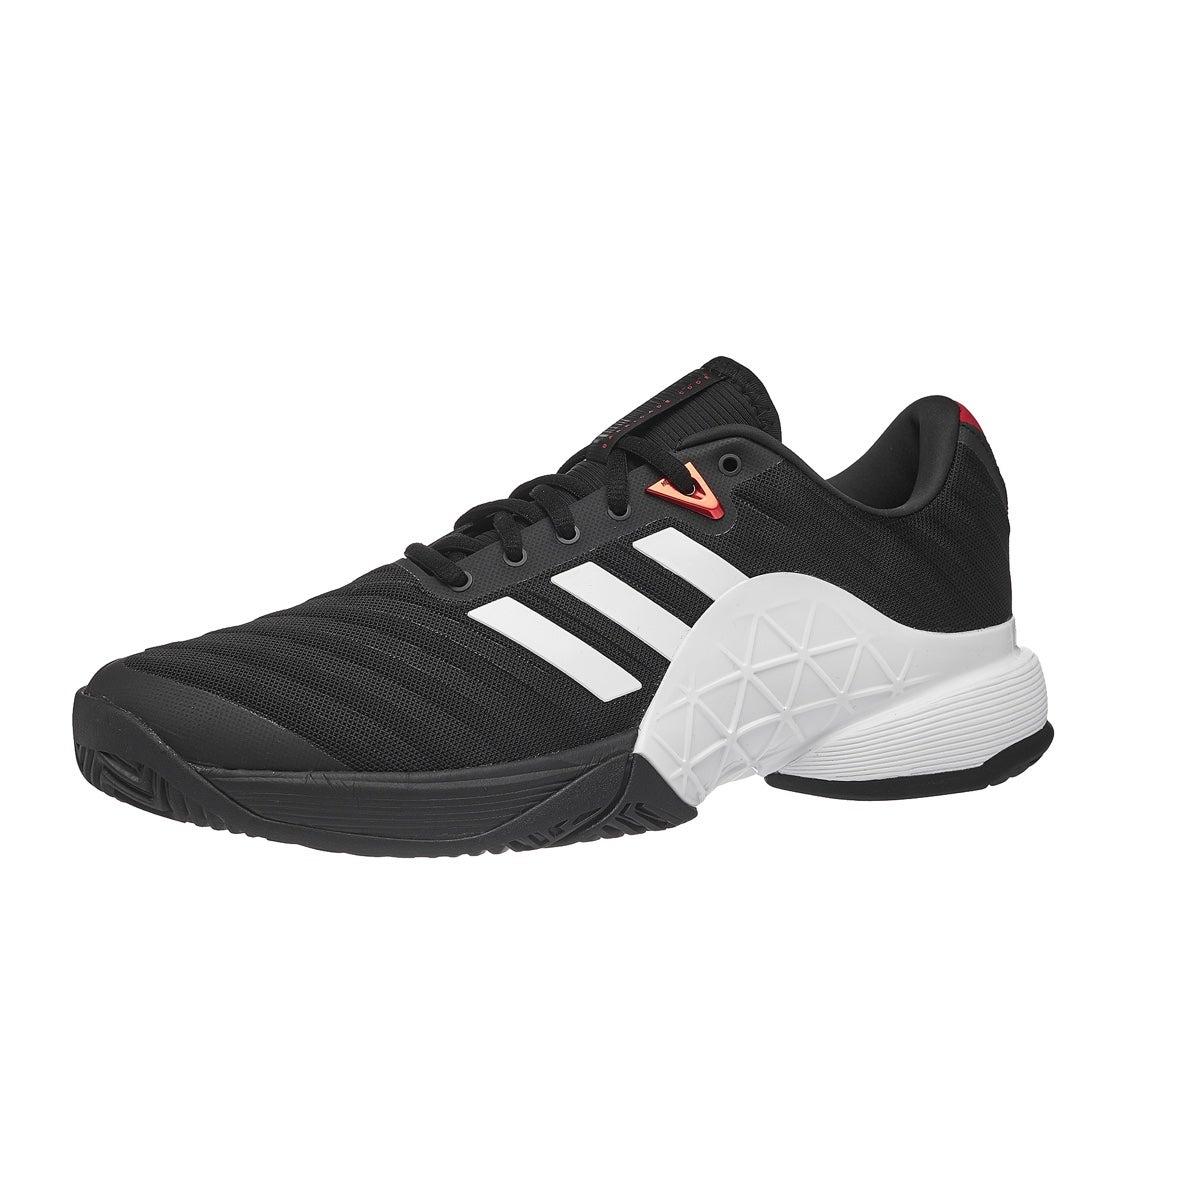 adidas barricata nero / bianco / 2018 scarlet scarpe da uomo 360 ° vista